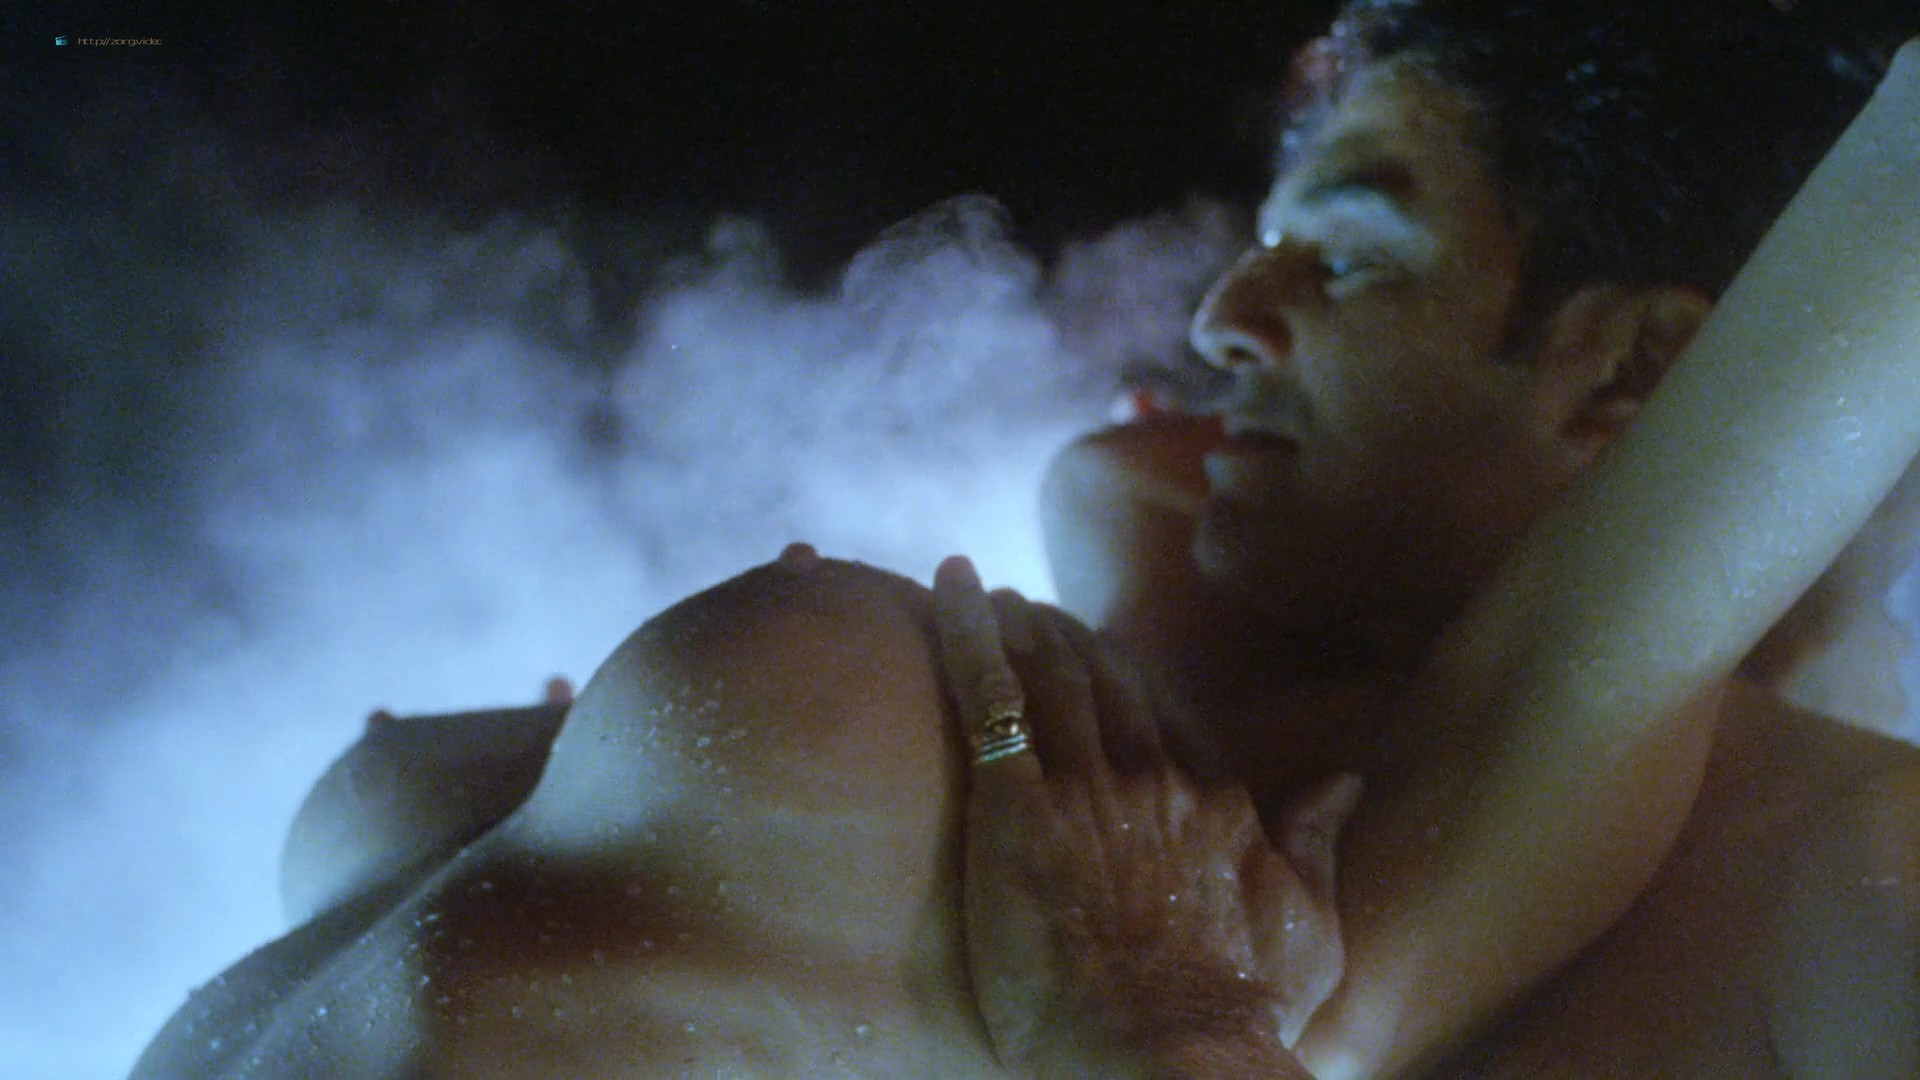 Dona Speir nude Pandora Peaks, Carolyn Liu and others nude too - Do or Die (1991) 1080p BluRay (3)